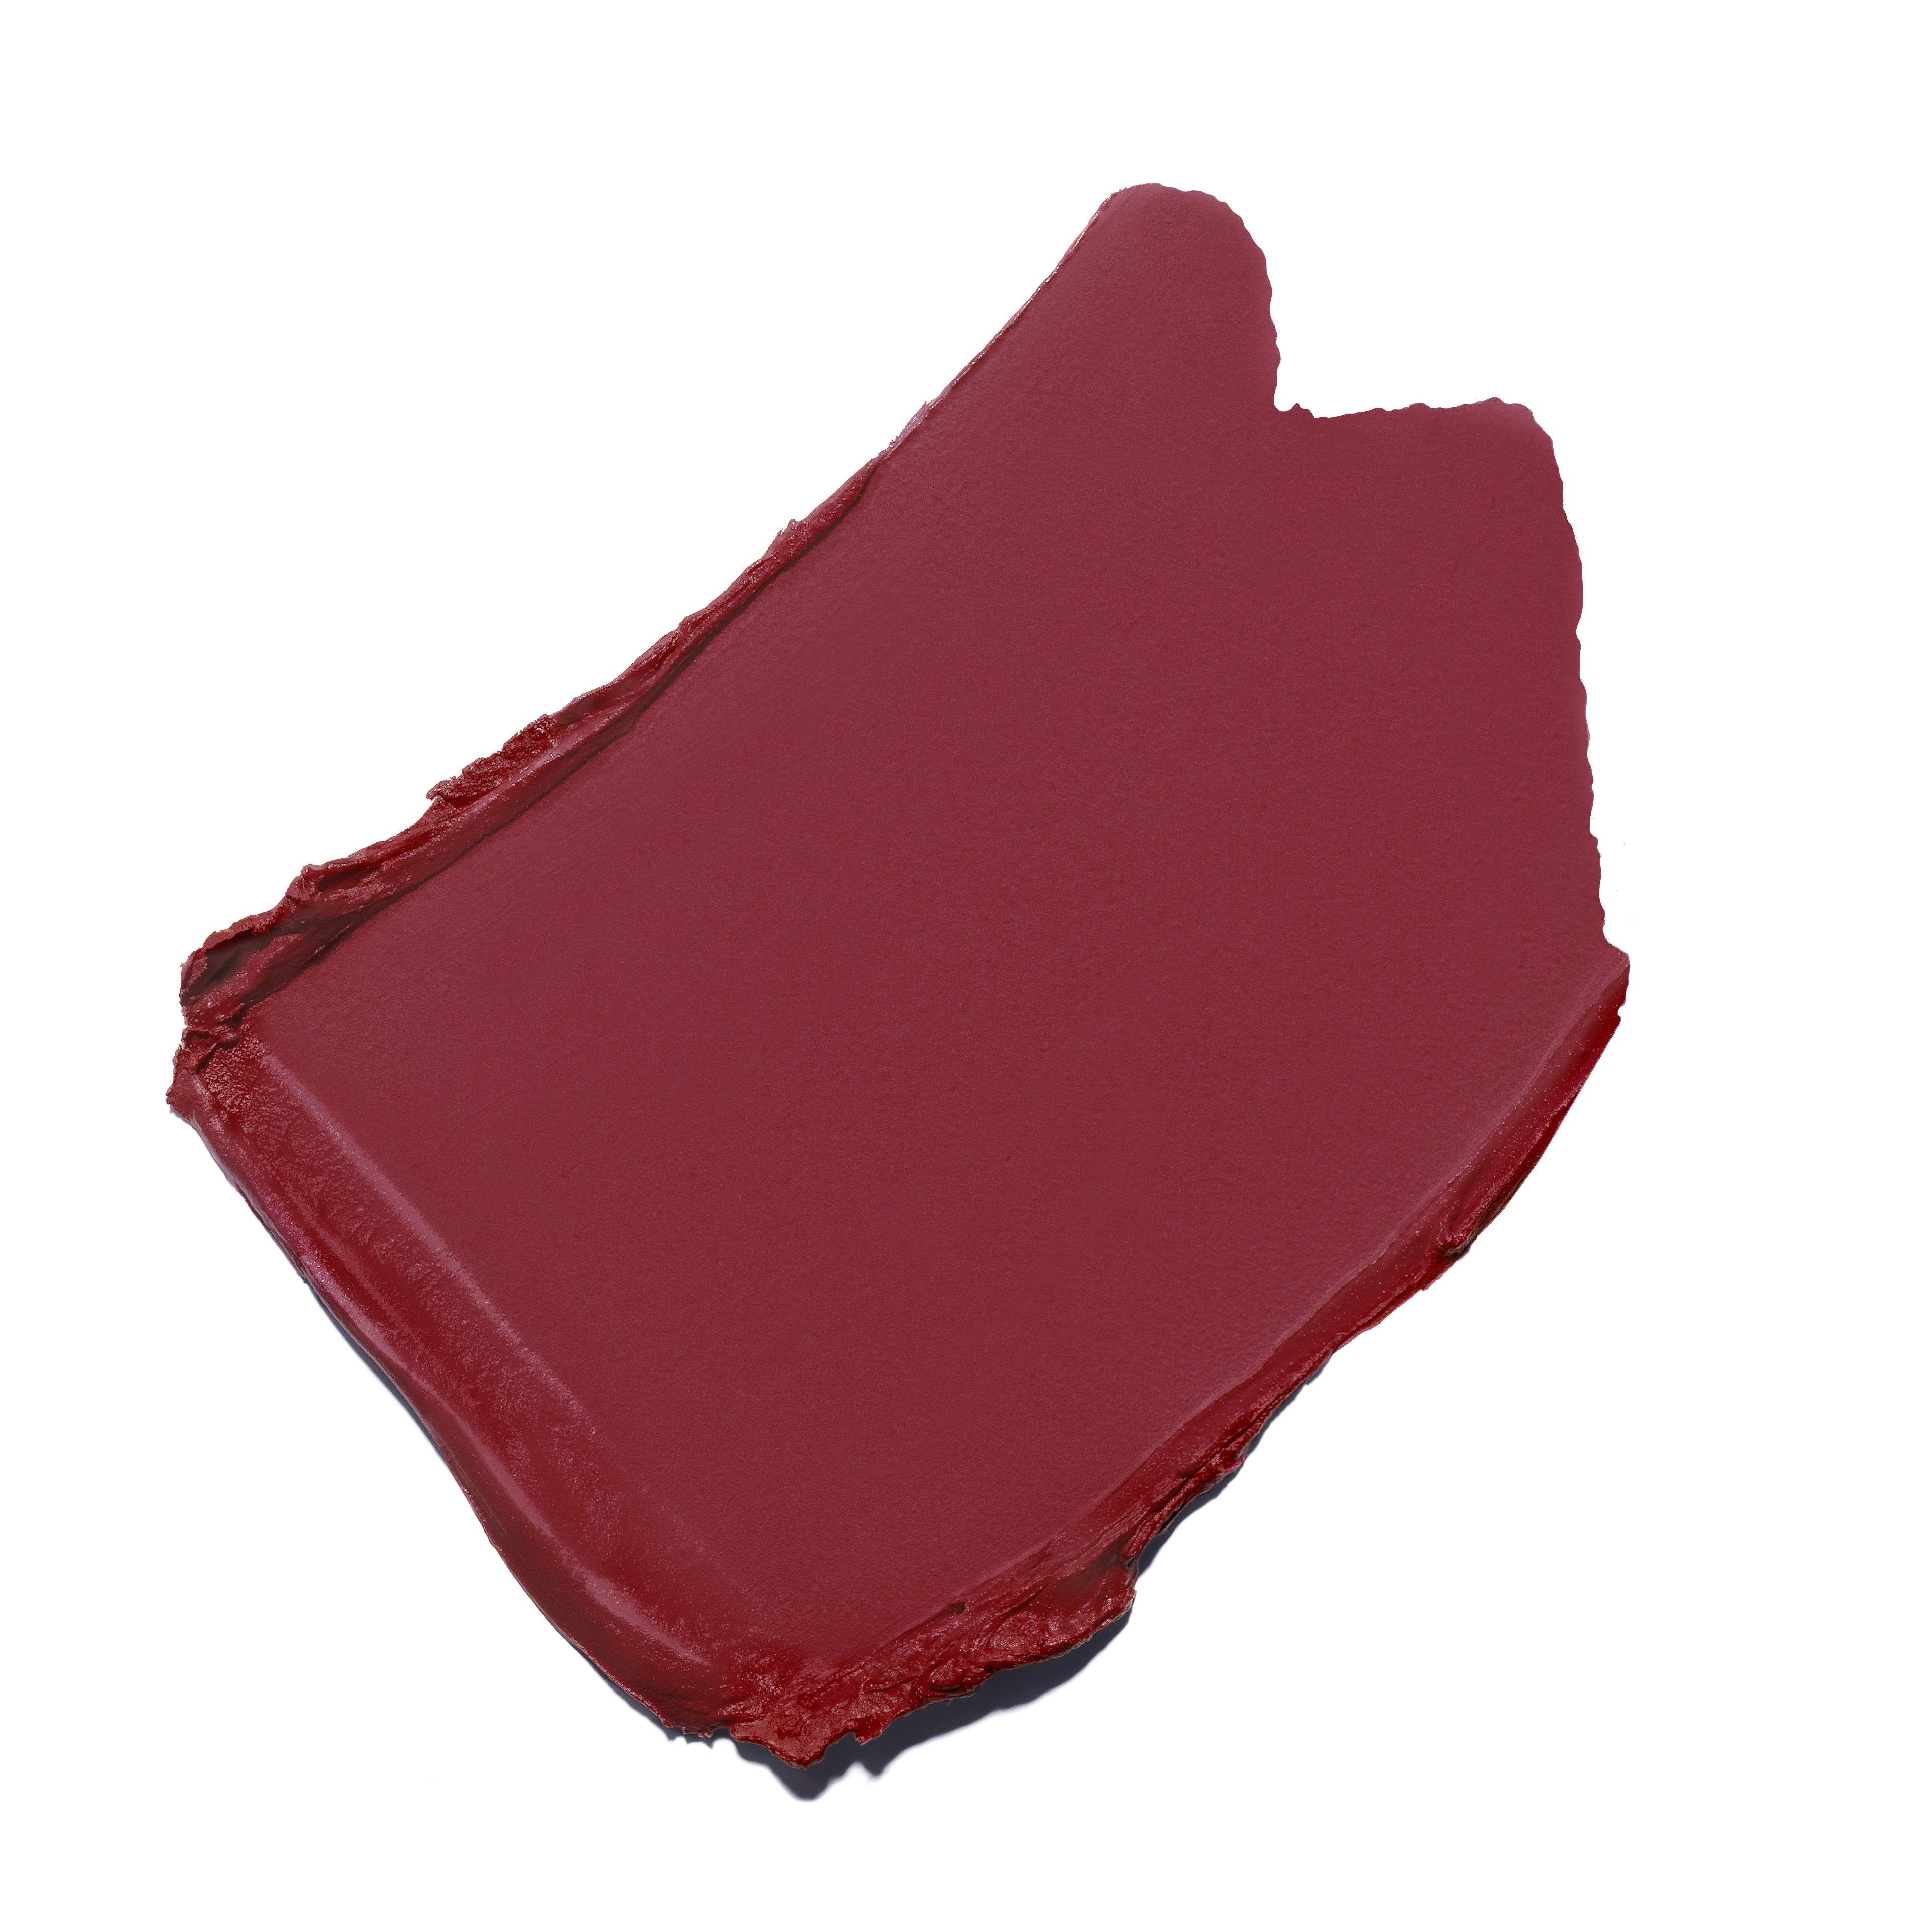 ROUGE ALLURE VELVET EXTRÊME - makeup - 3.5g - มุมมองพื้นผิวธรรมดา